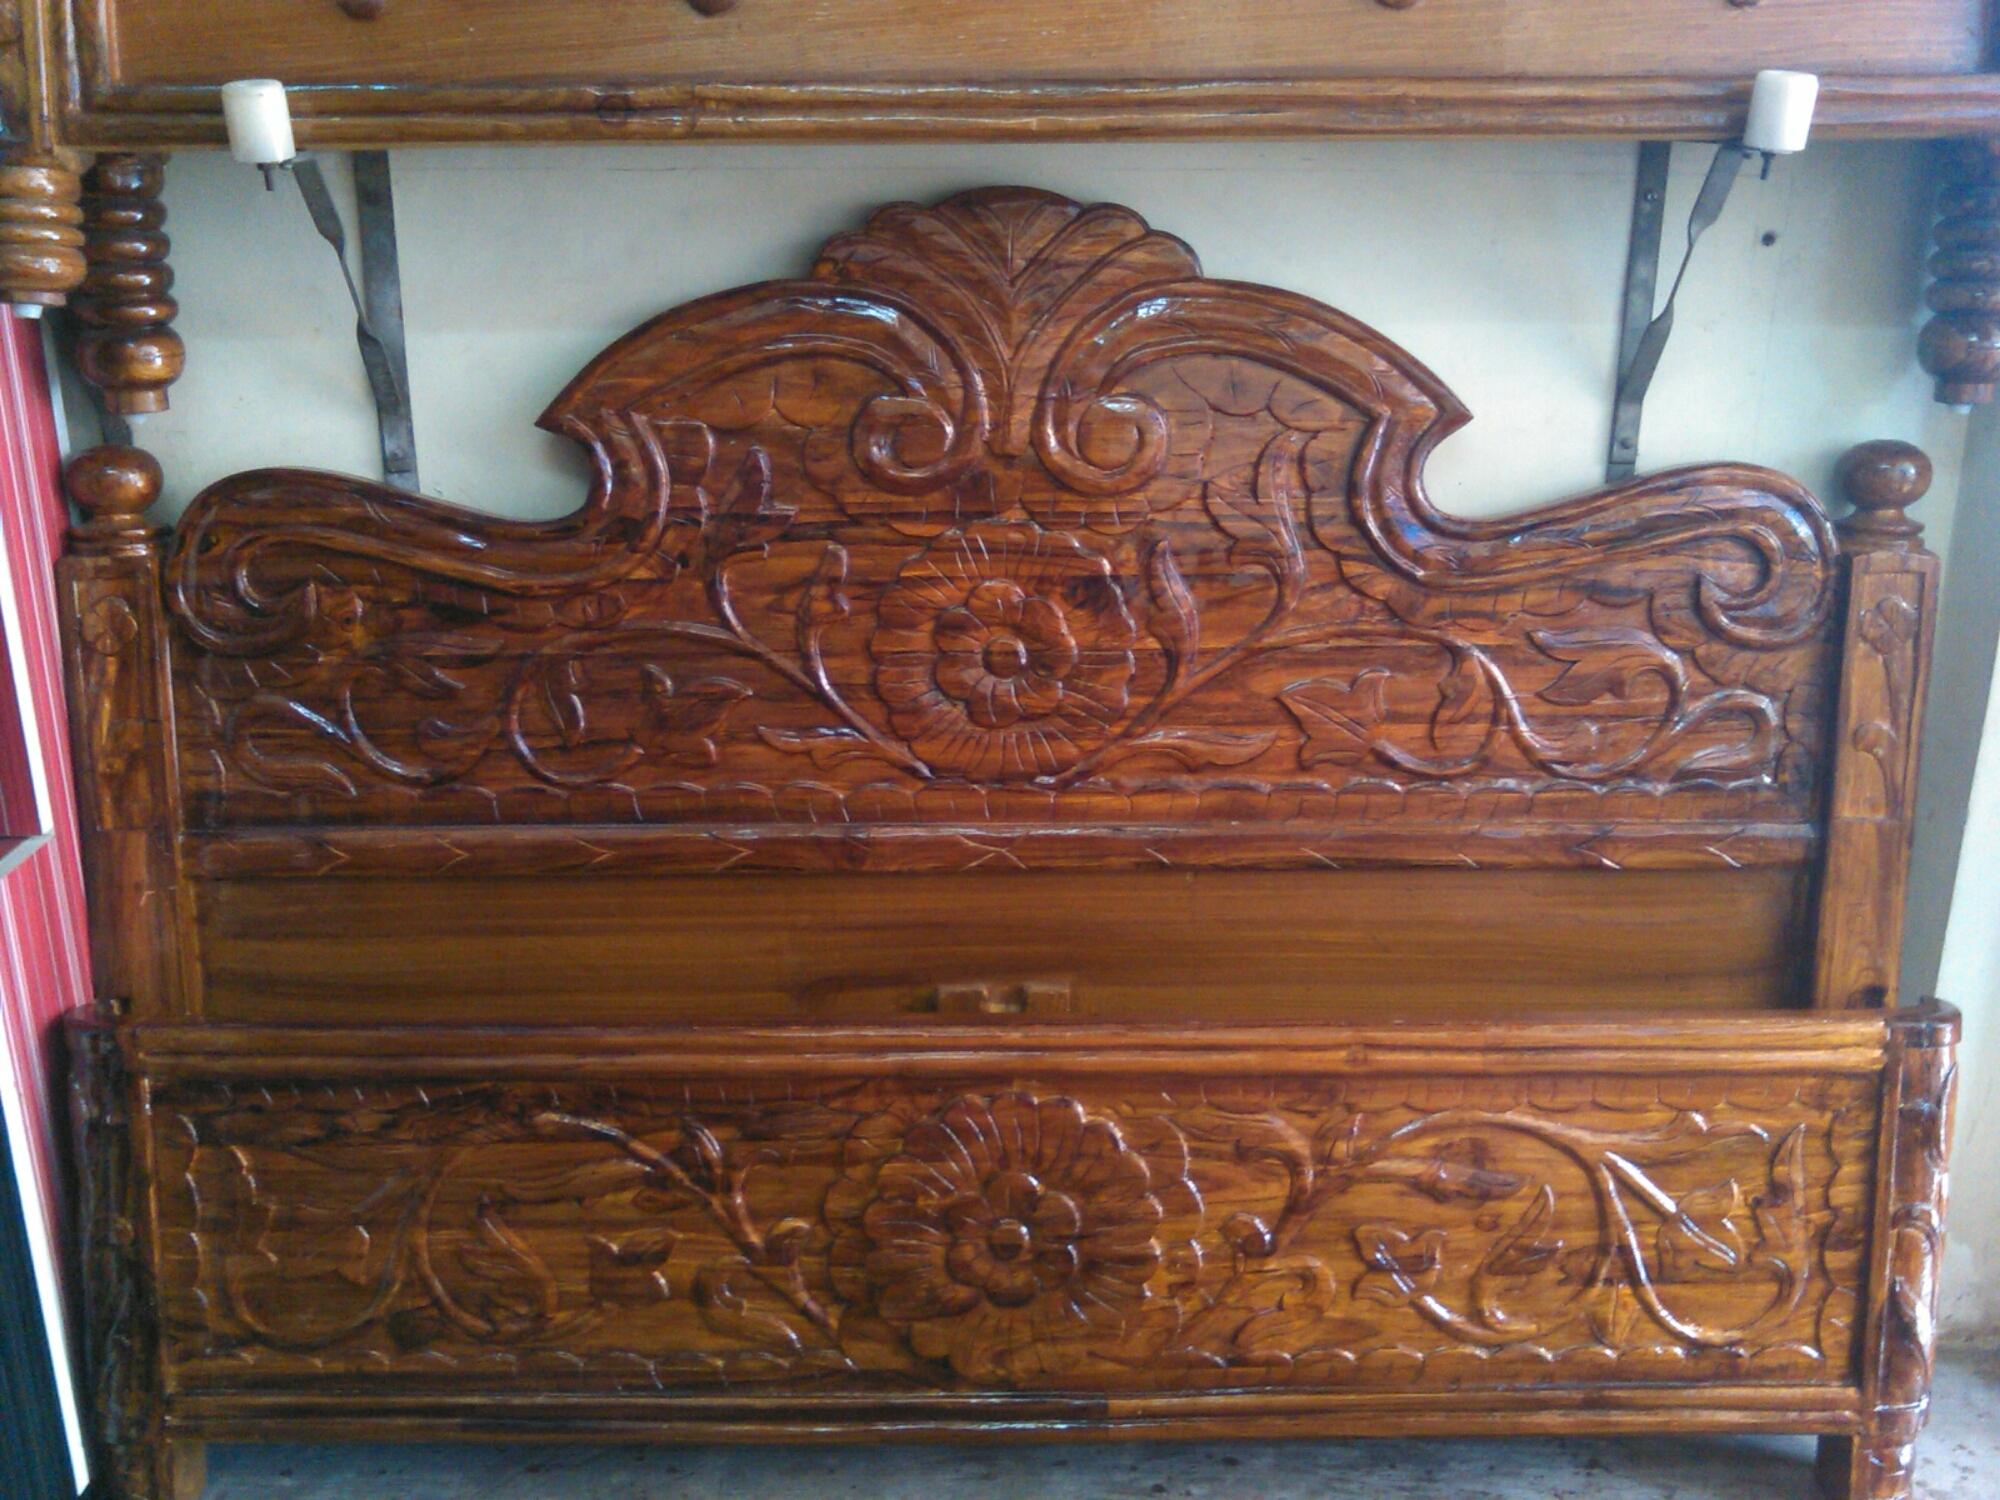 teak wood sofa set designs furniture images teakwood cot models | johnsaida